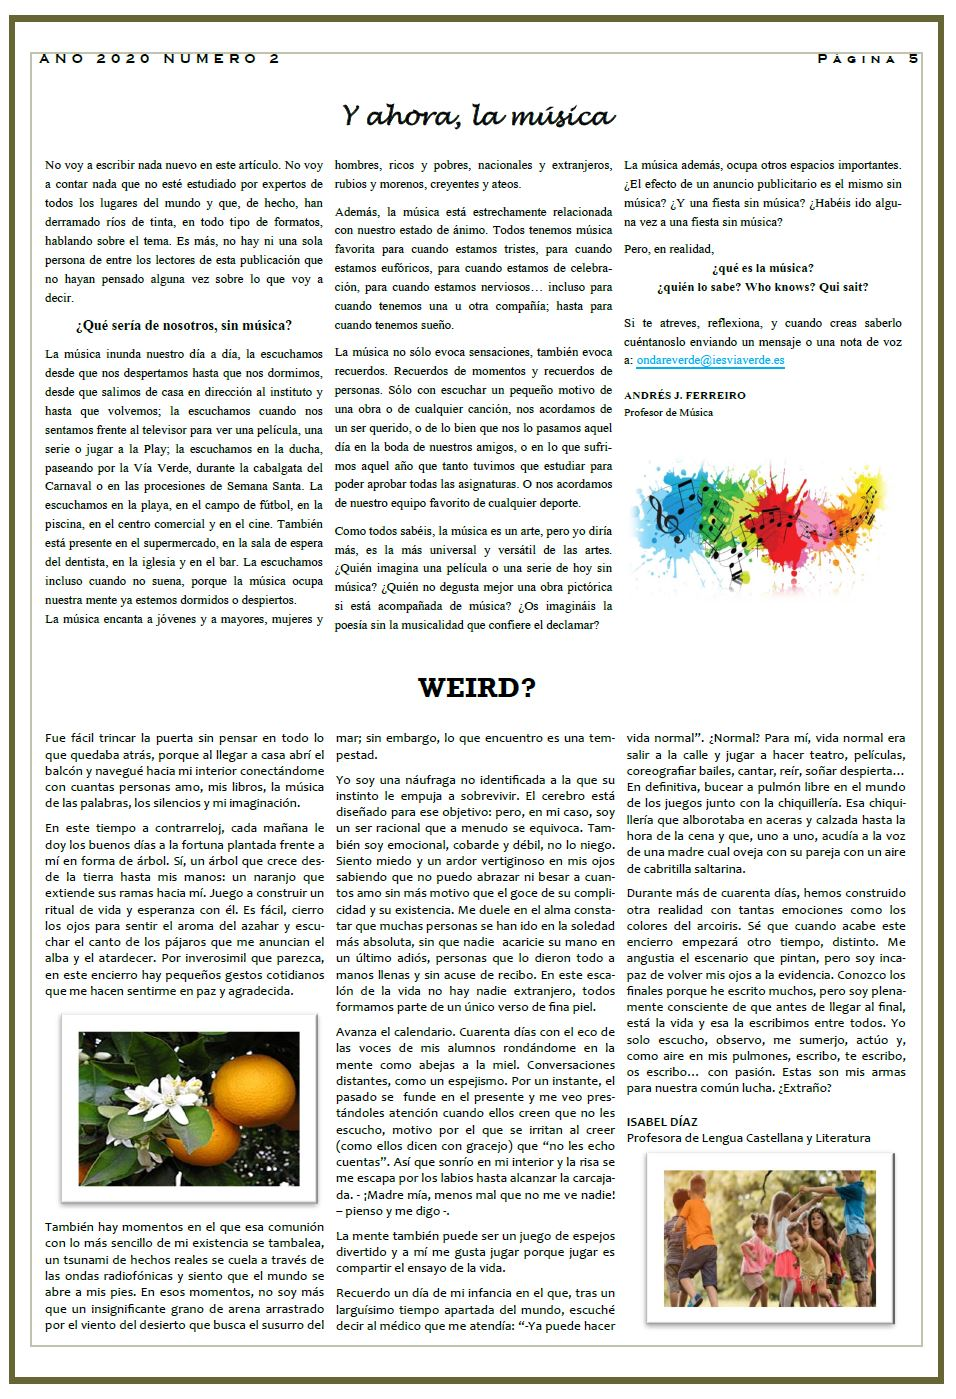 Prensa2- Pagina5